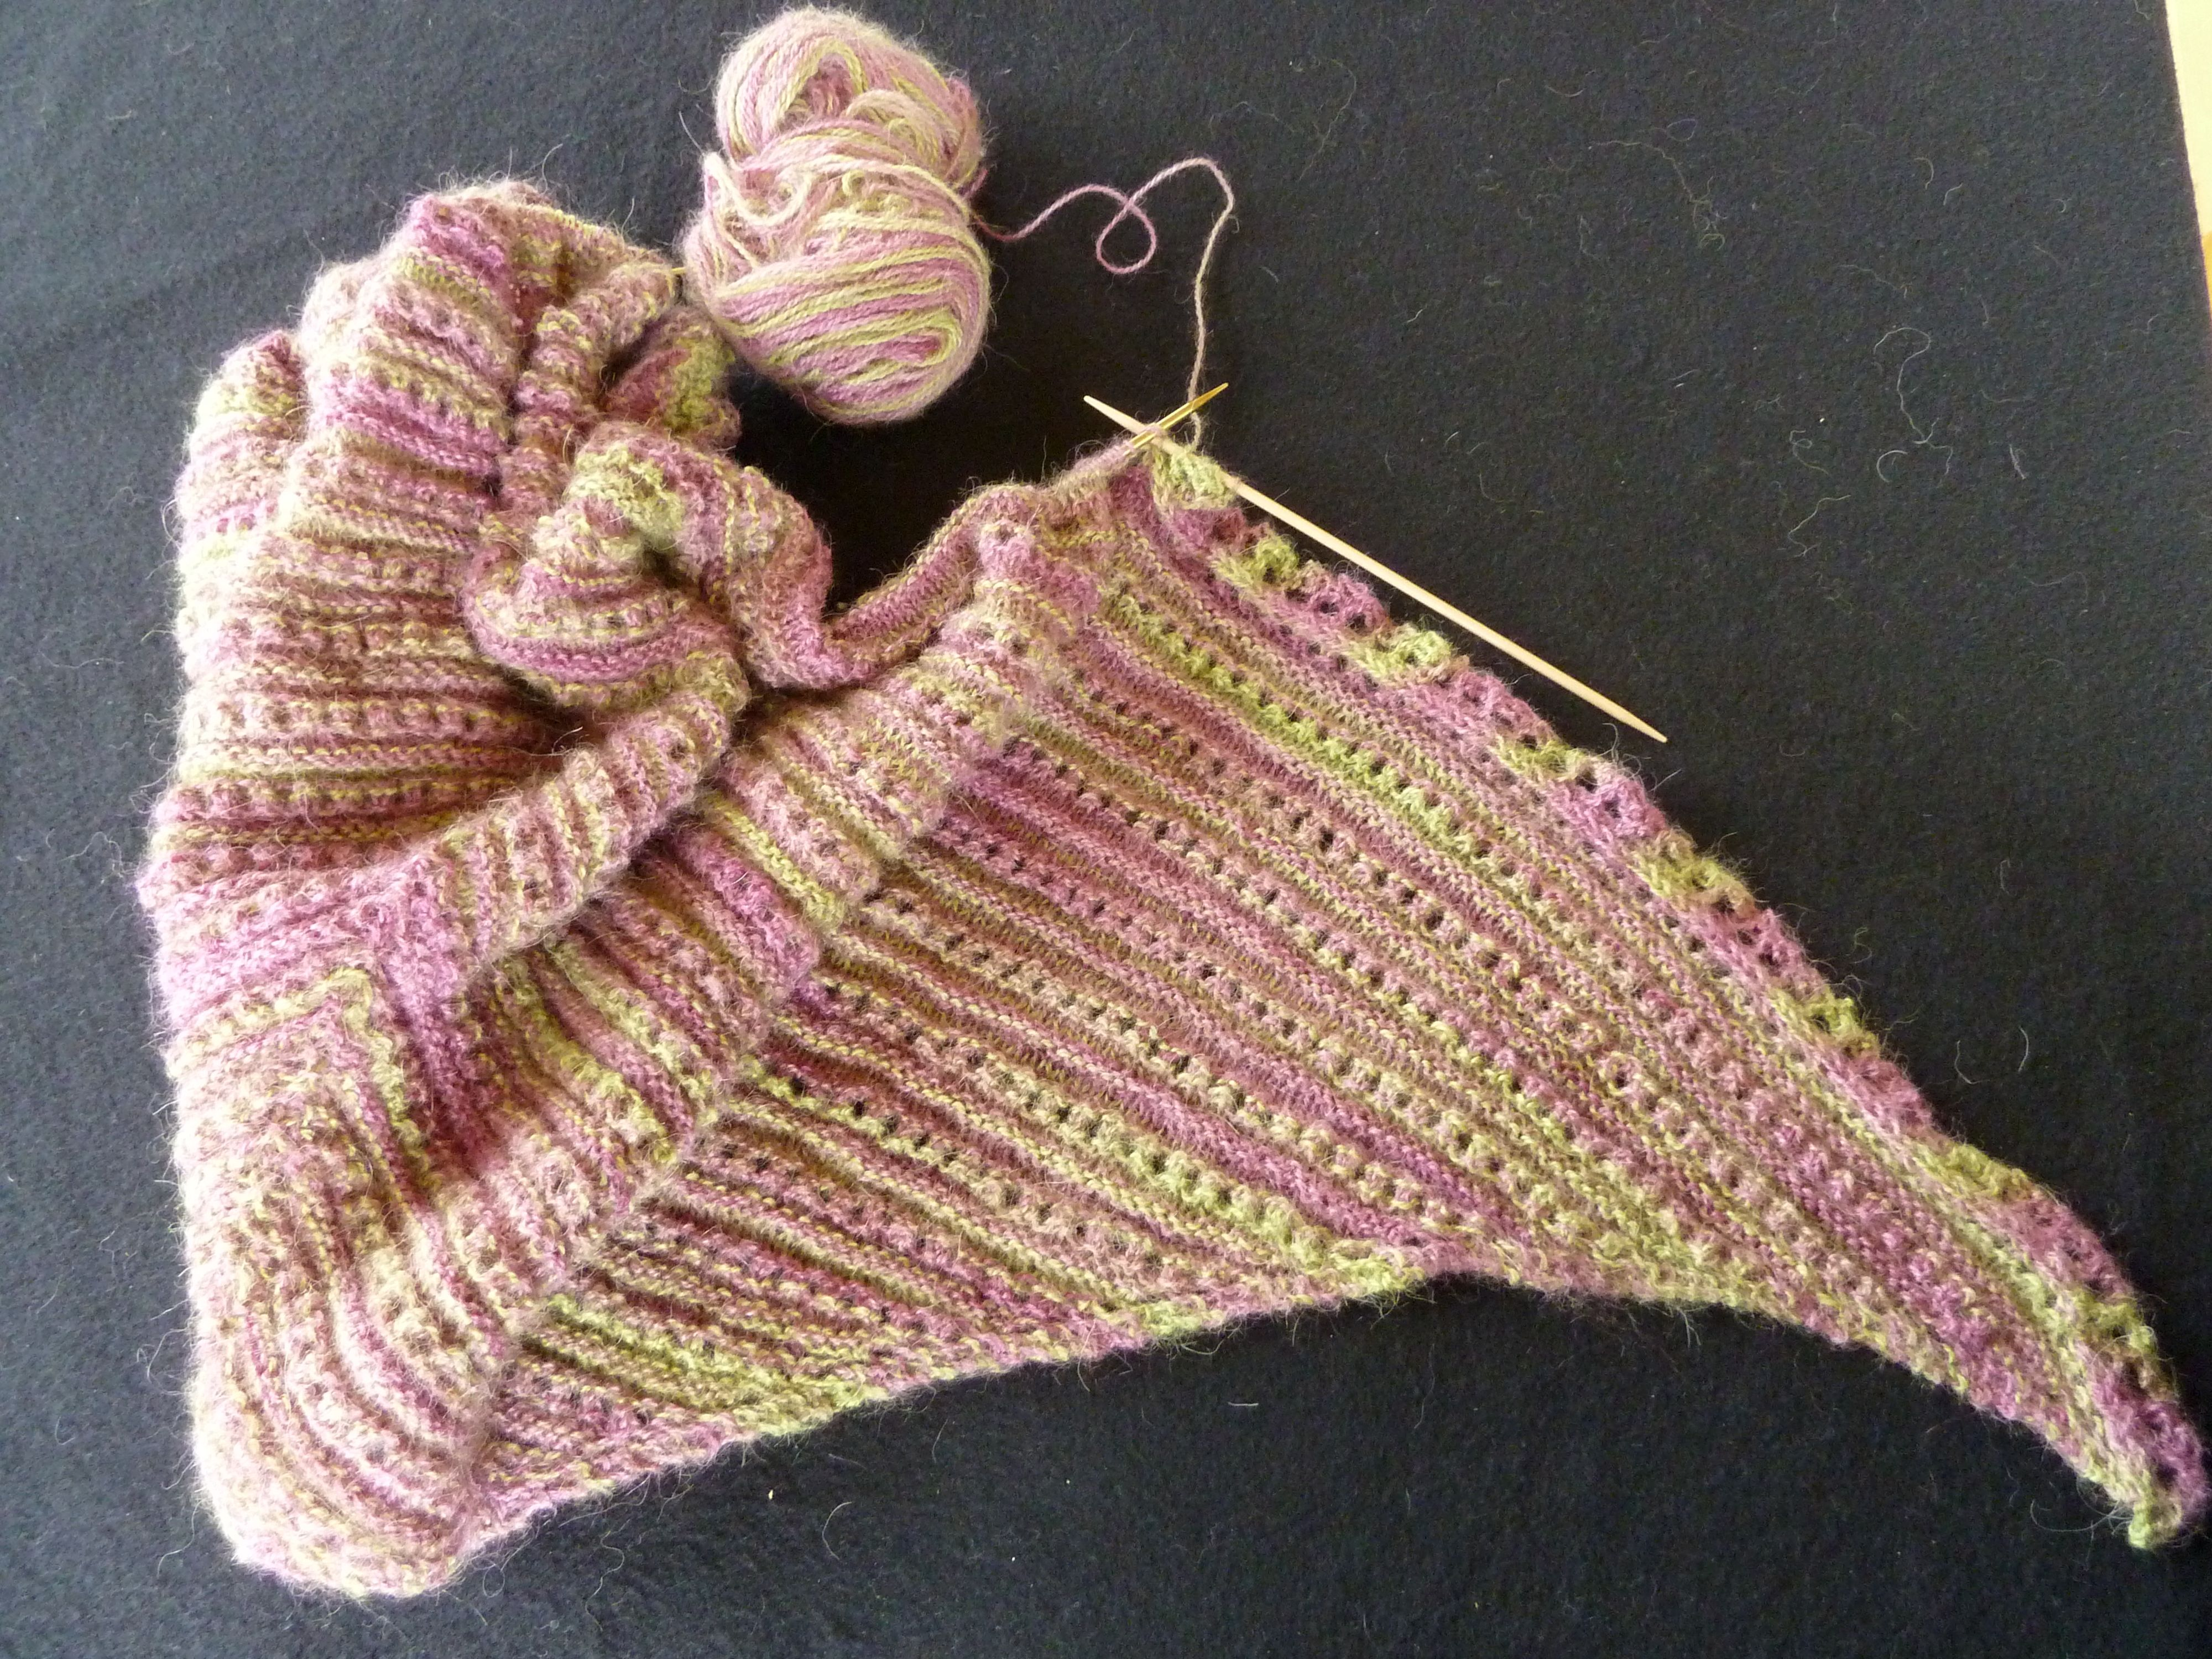 Knitting – Page 2 – Betsy McCarthy knits